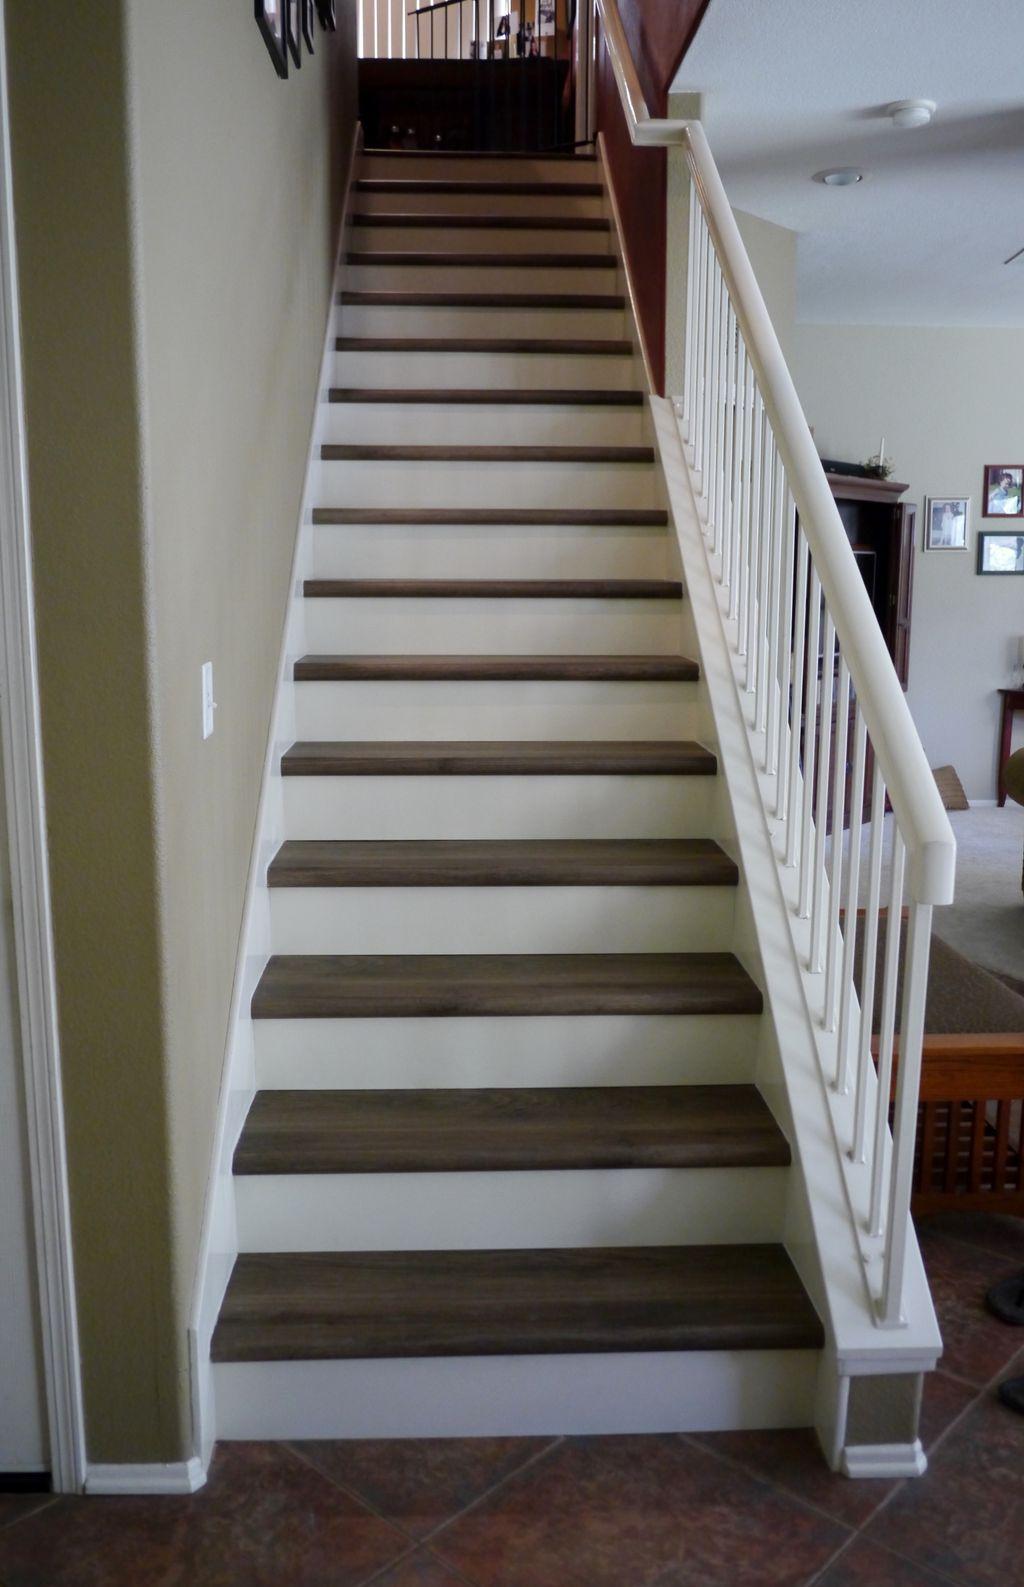 Stairs, Hallway and Bathroom LVP